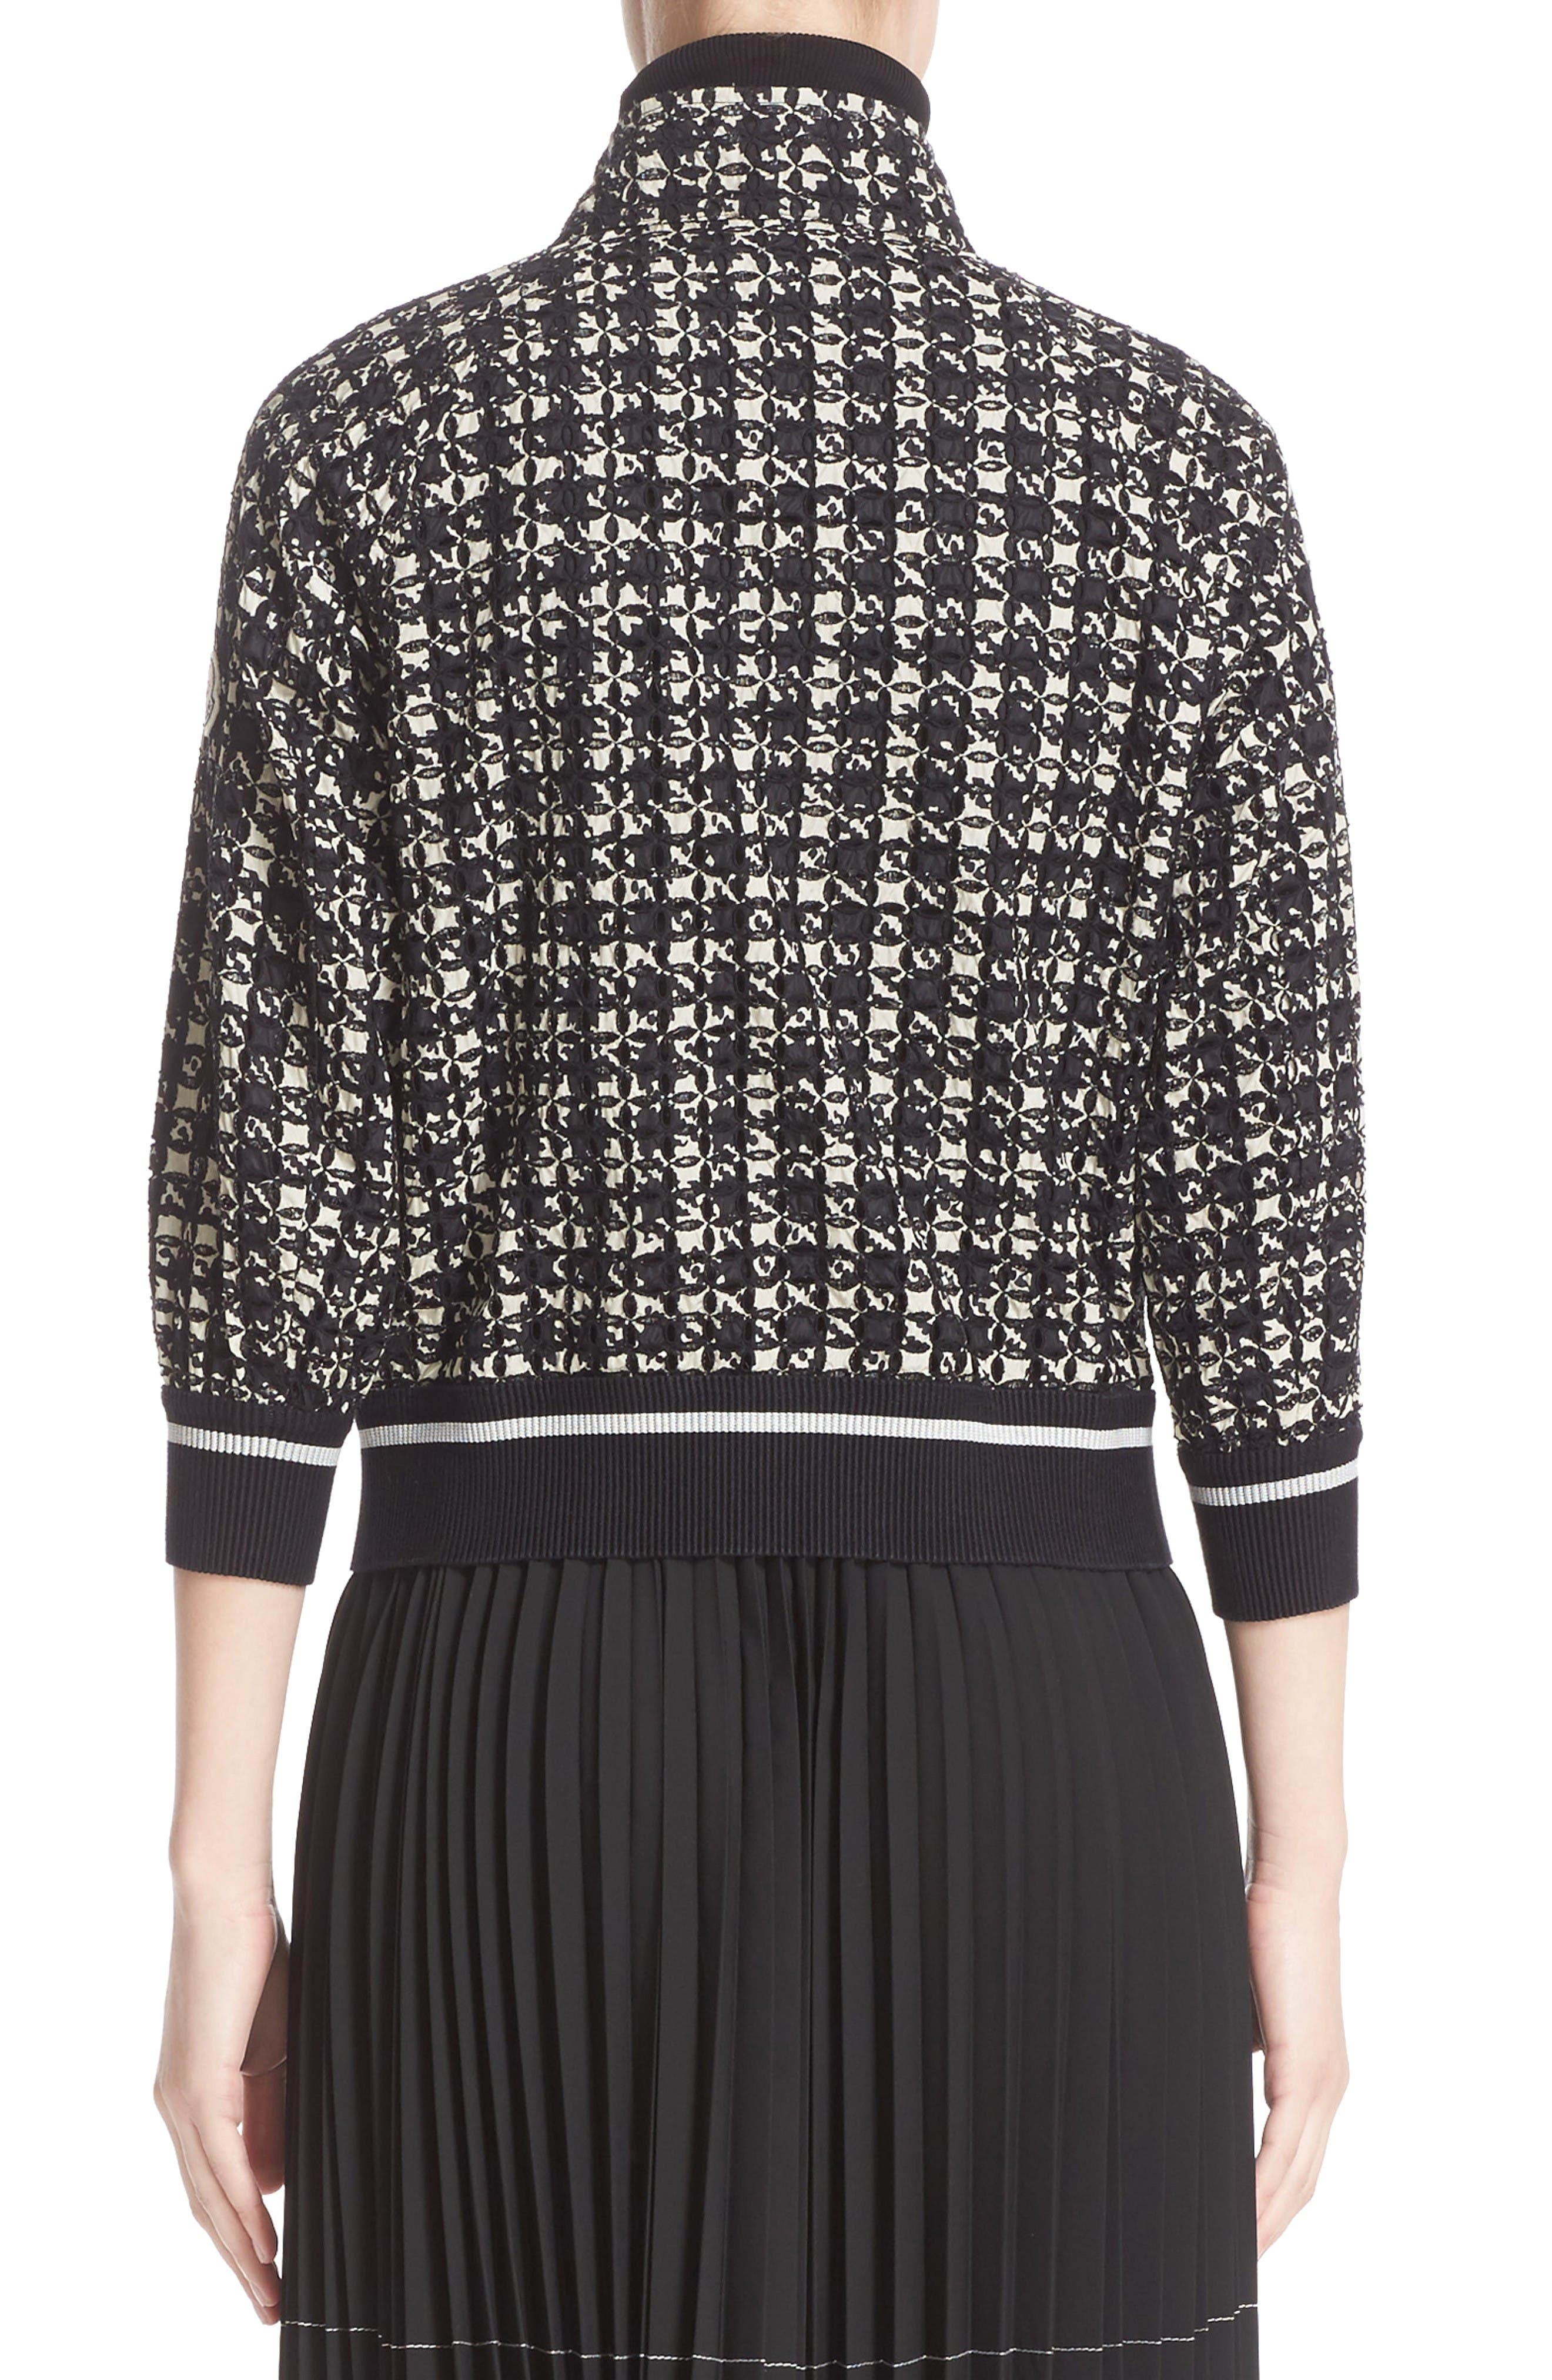 Alternate Image 2  - Moncler Fiadone Tweed Print Jacket